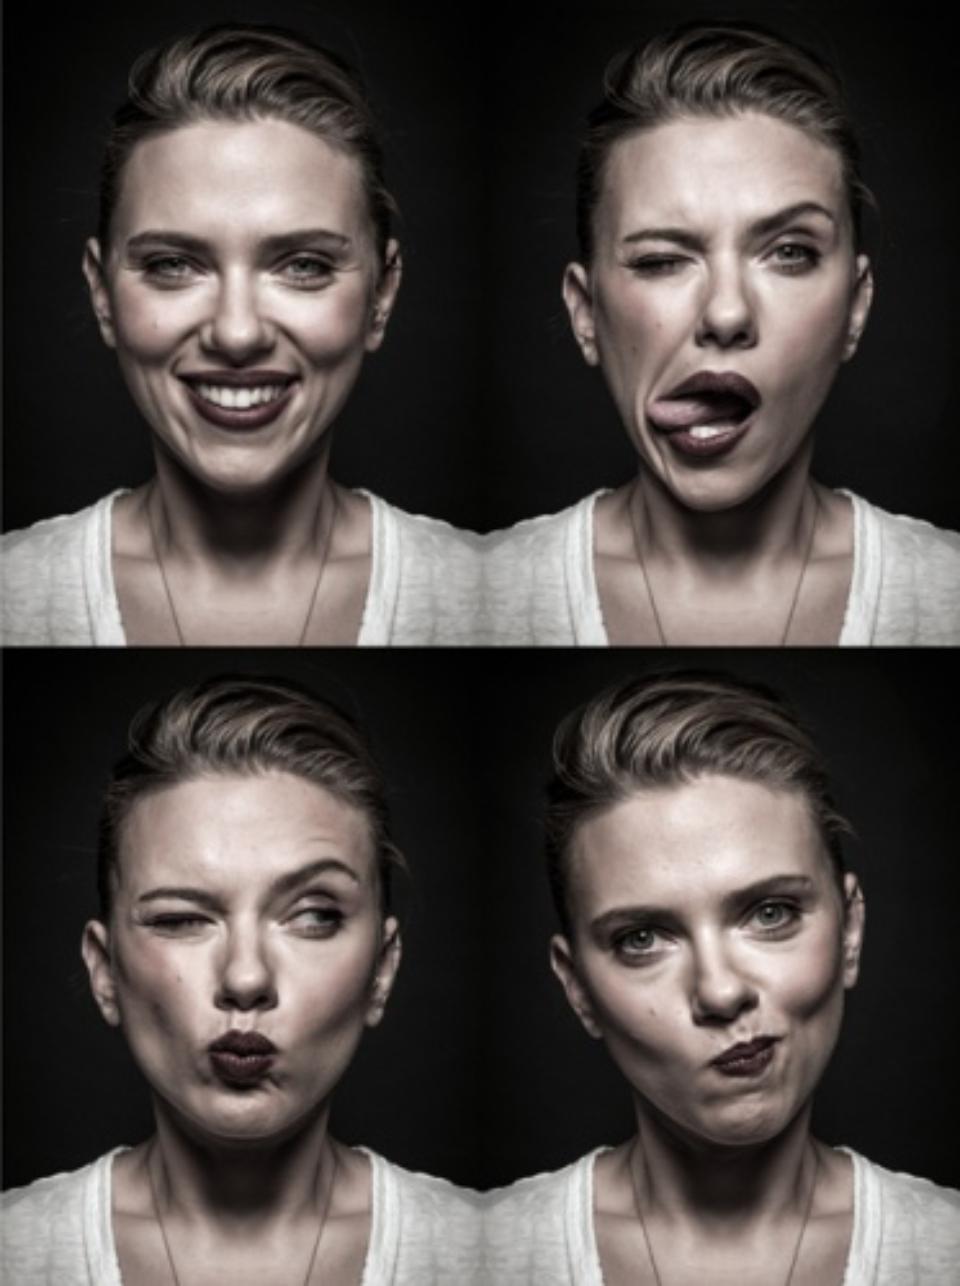 Andy Gotts: Scarlett Johannson